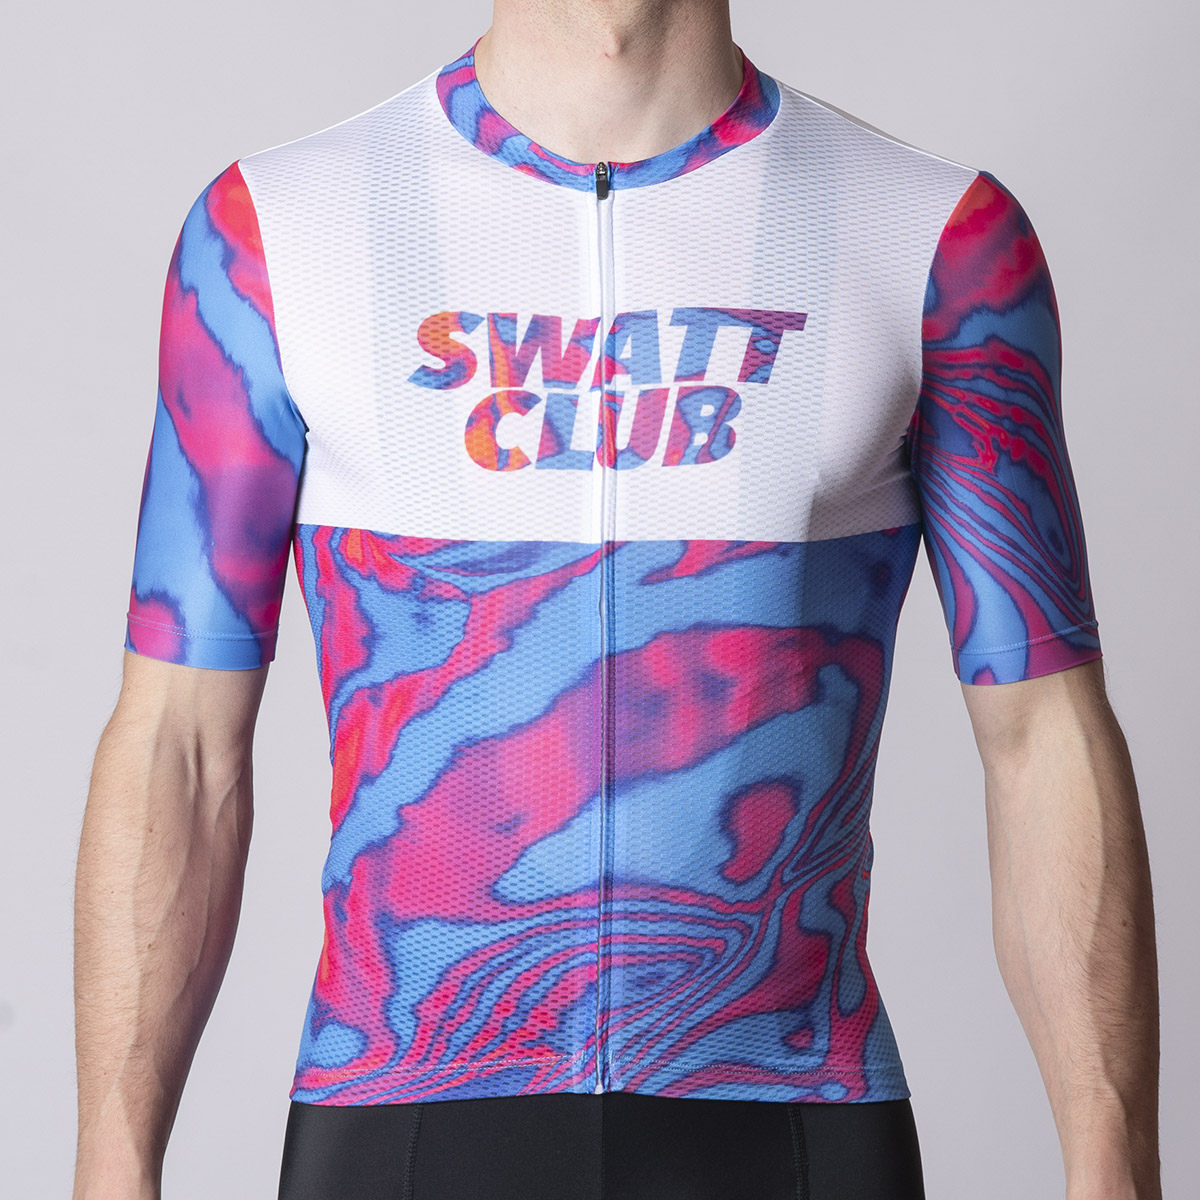 Lava cycling jersey swatt club